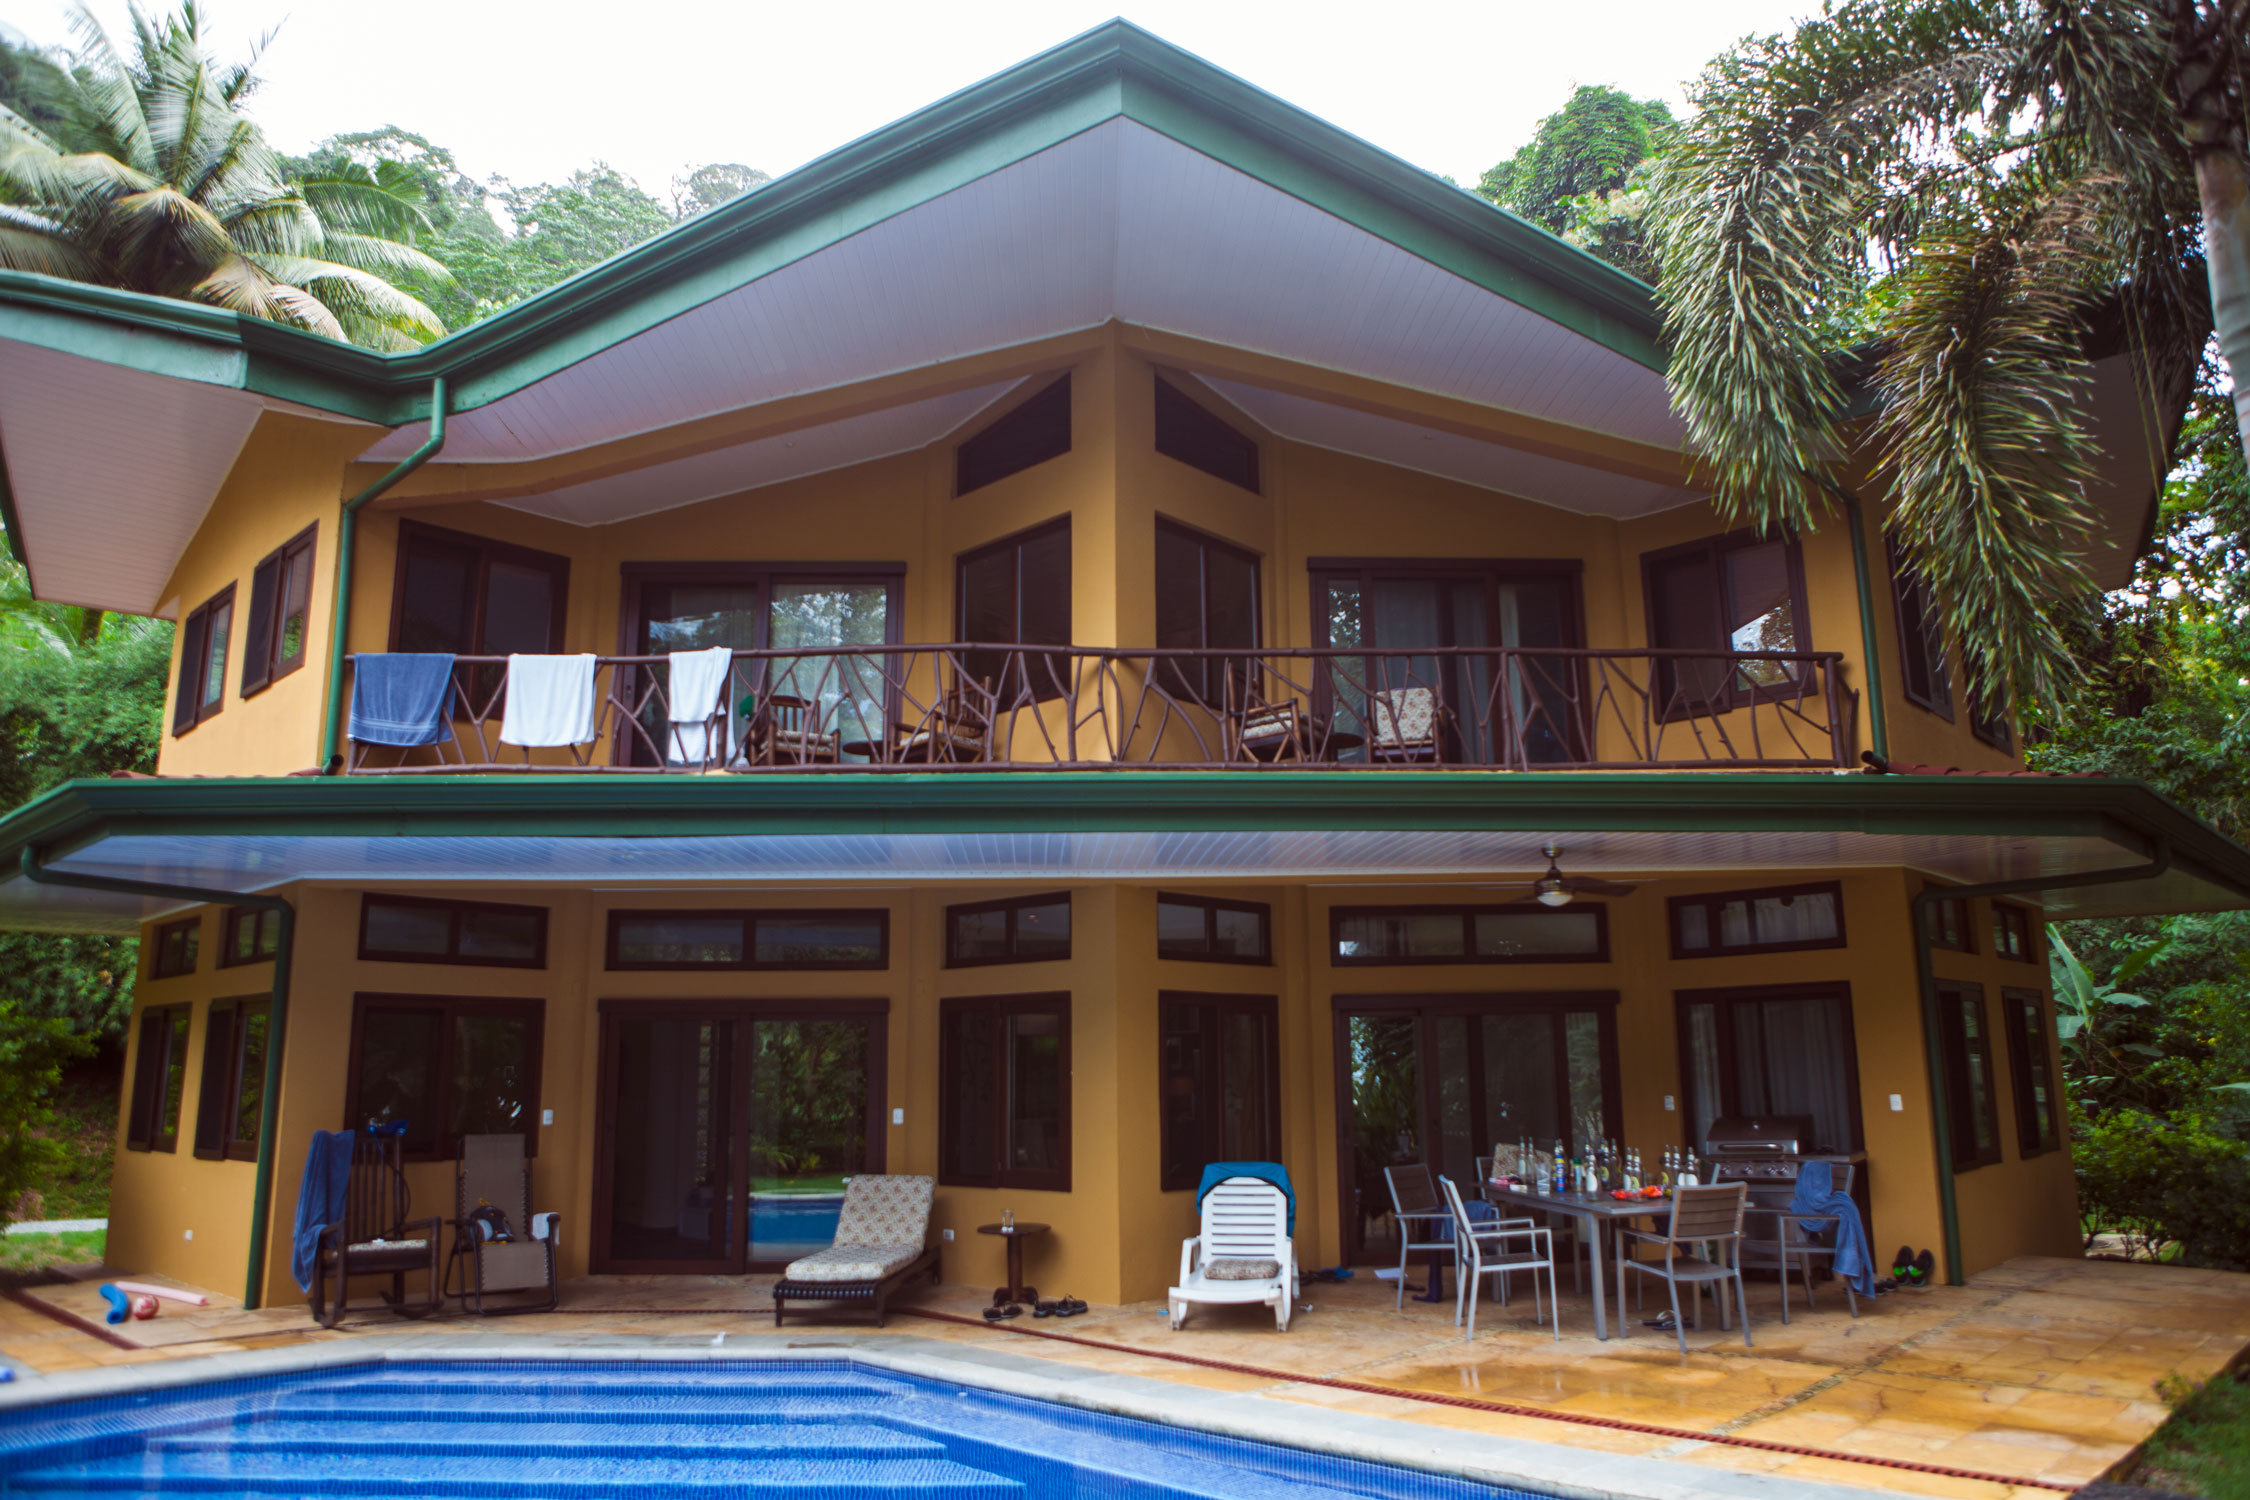 dominical-costa-rica-wander-south-house.jpg